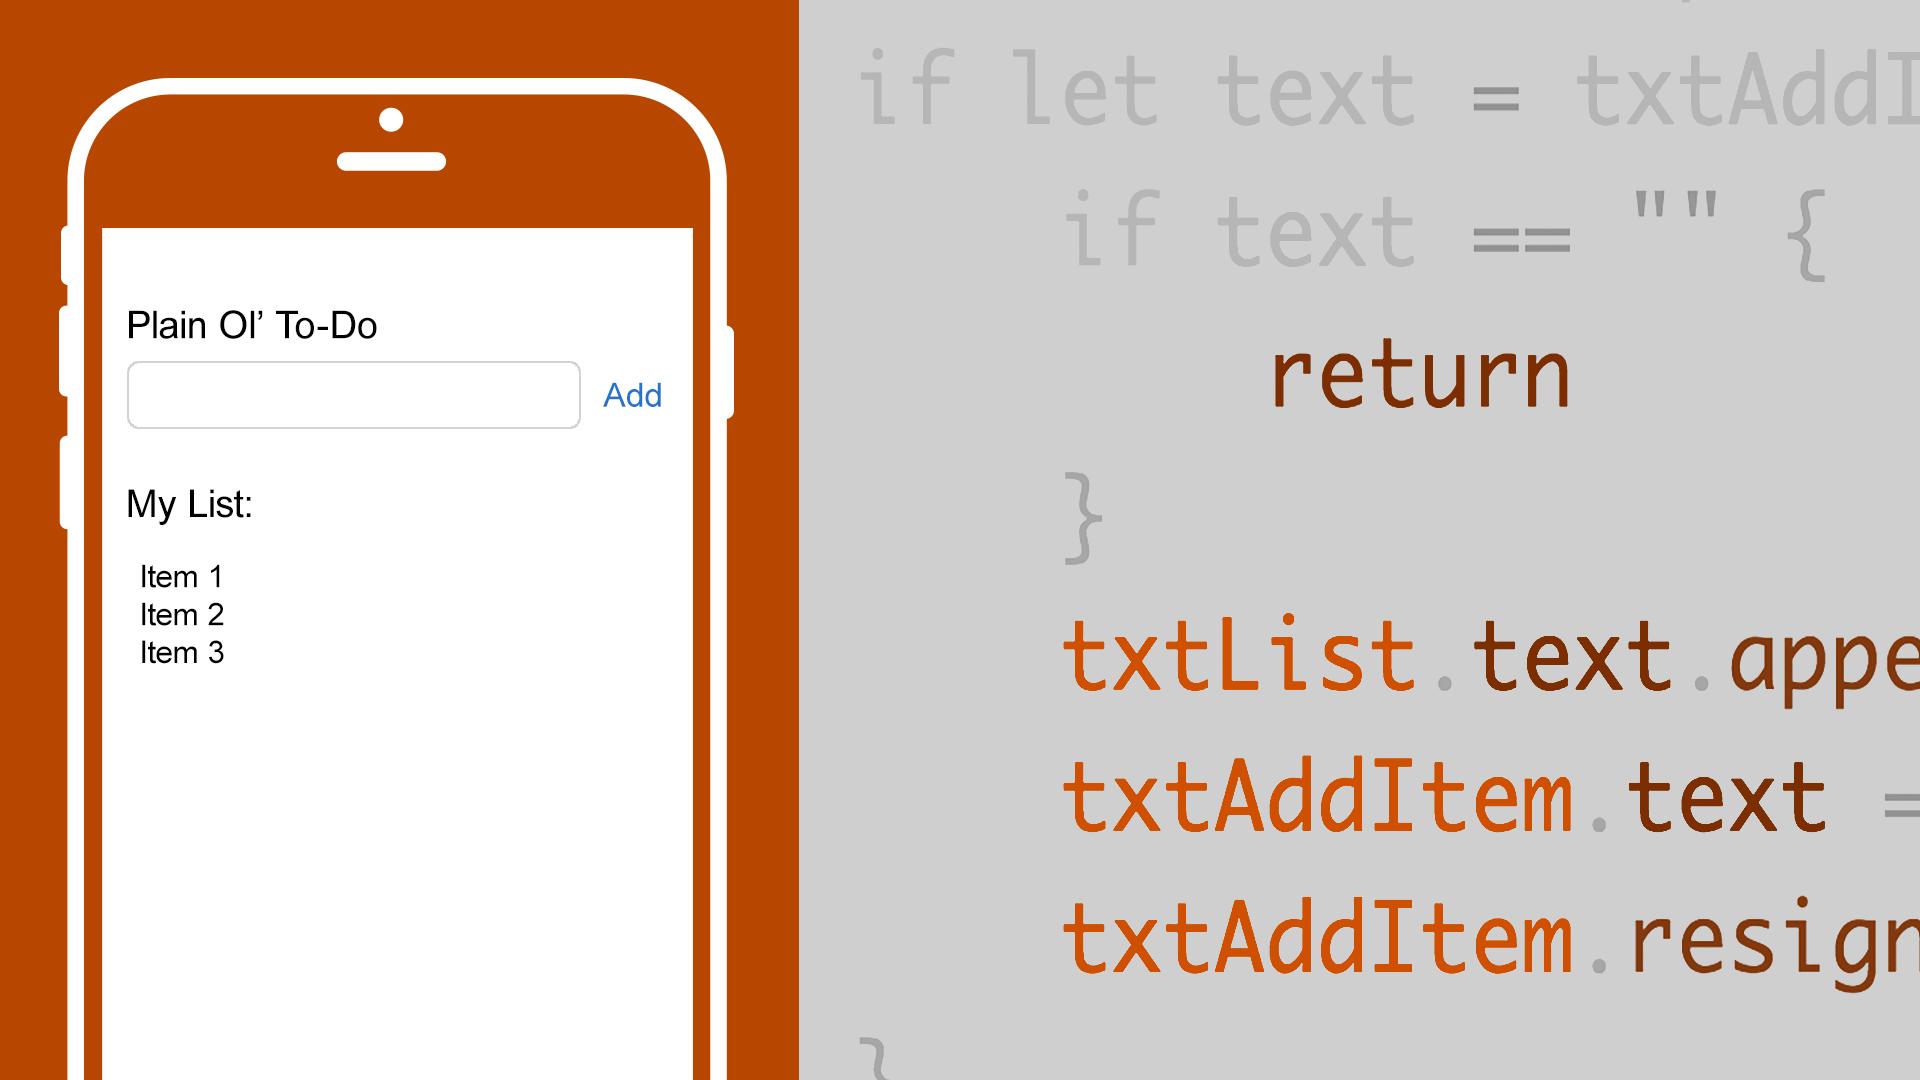 android sdk essential training lynda torrent download